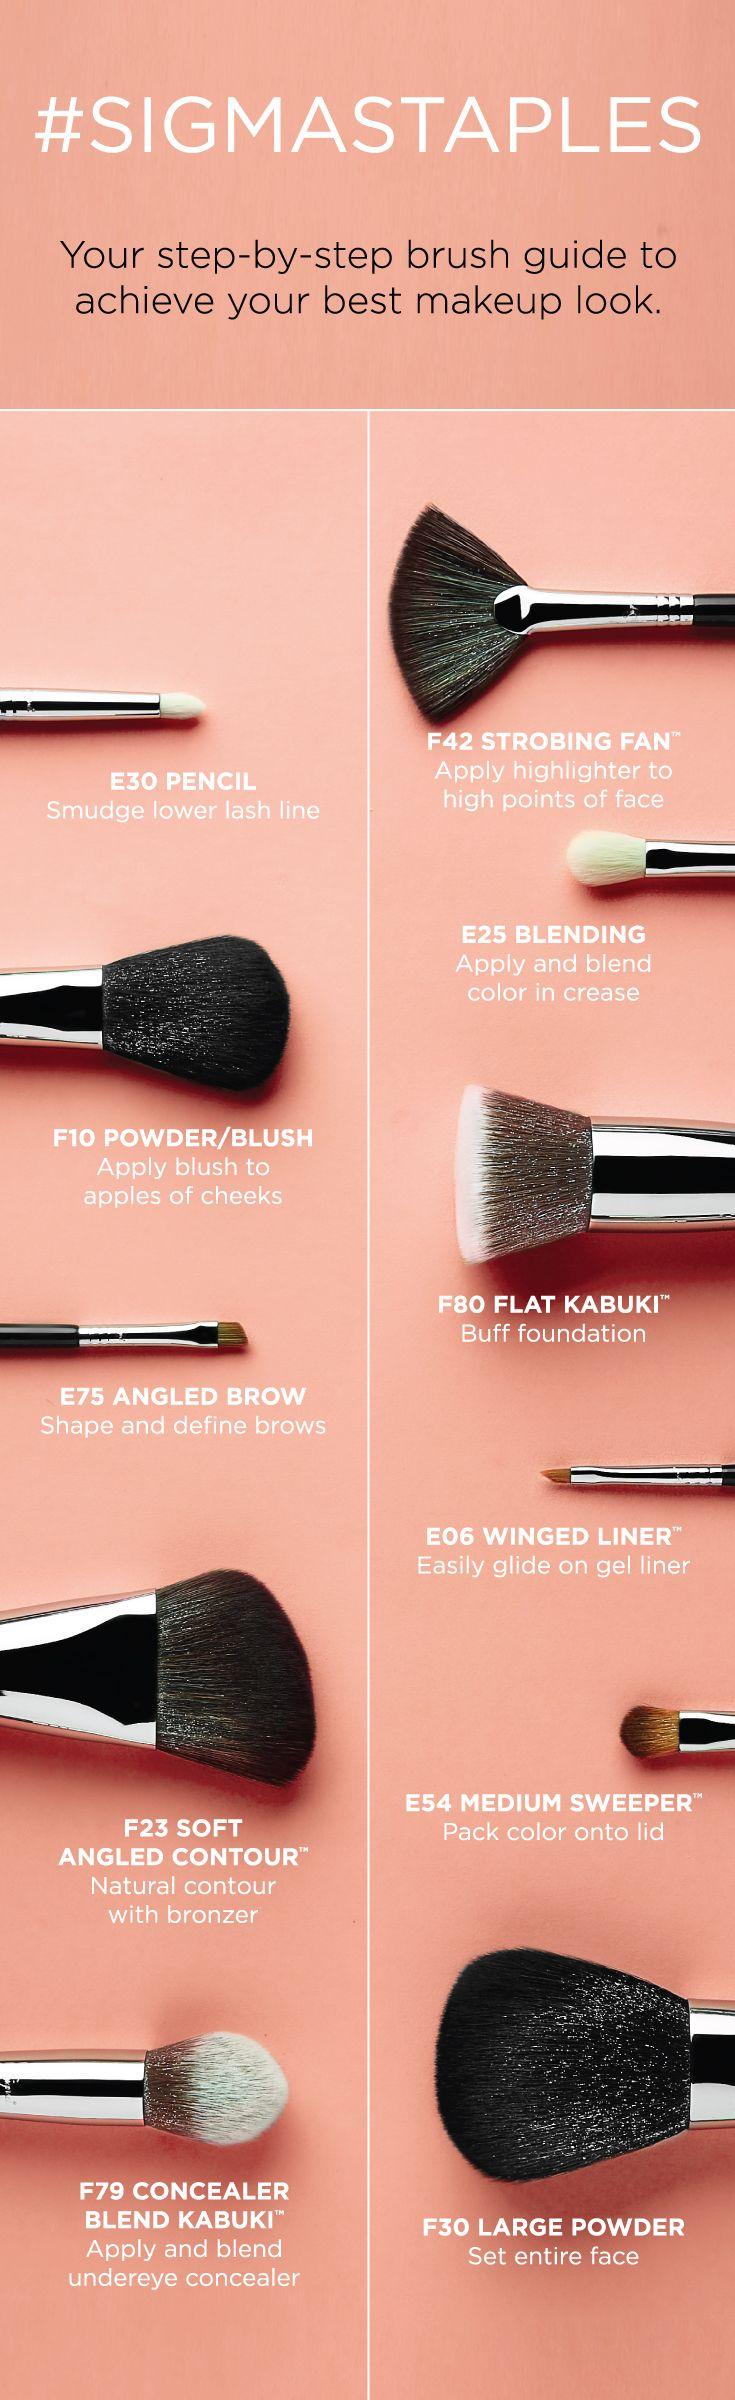 Makeup Brush Guides Sigma Beauty Best Makeup Products Makeup Brushes Guide Makeup Brushes 101